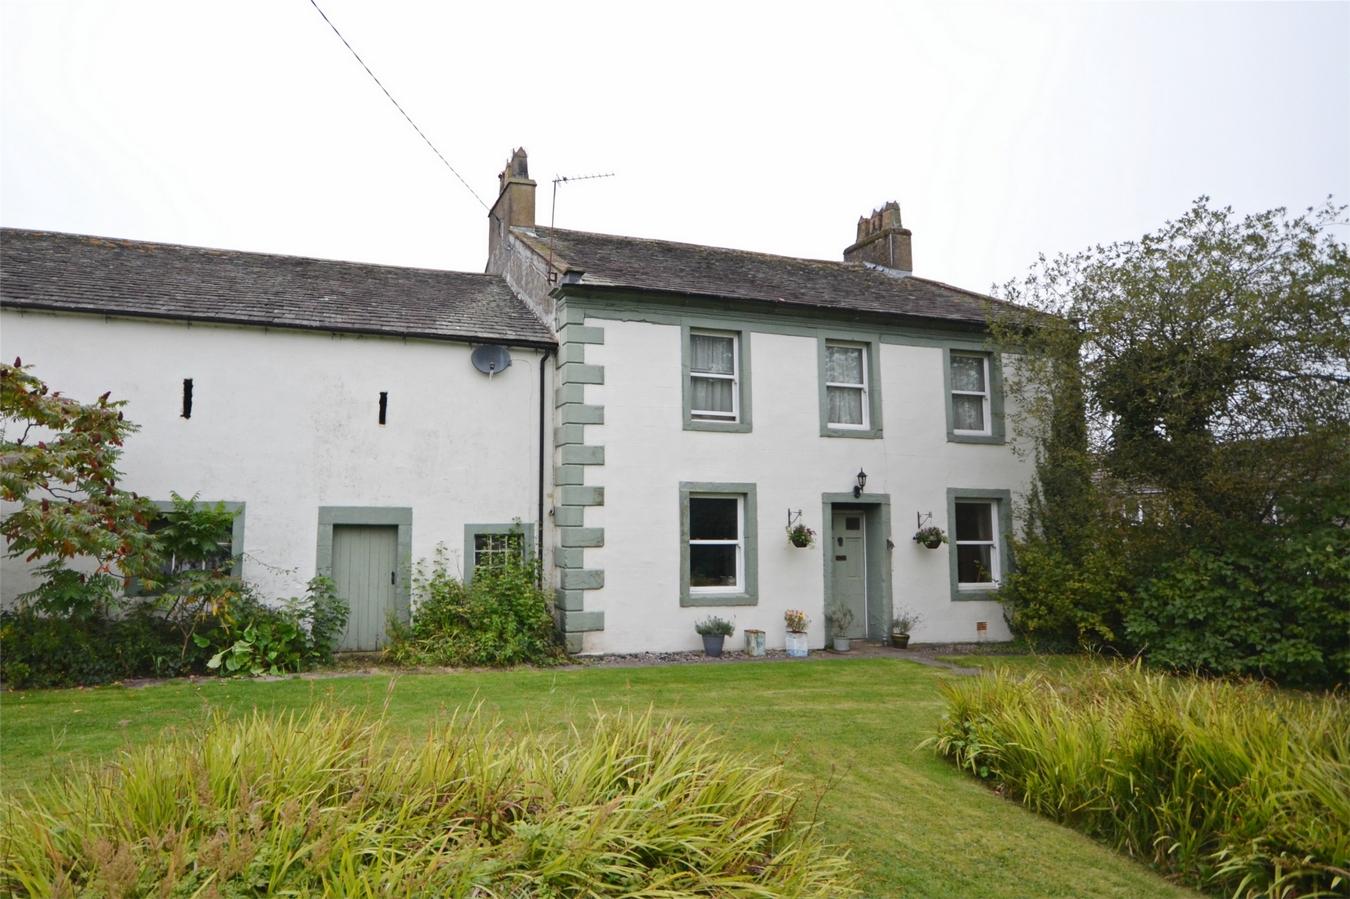 Cumbria white sage green country period home